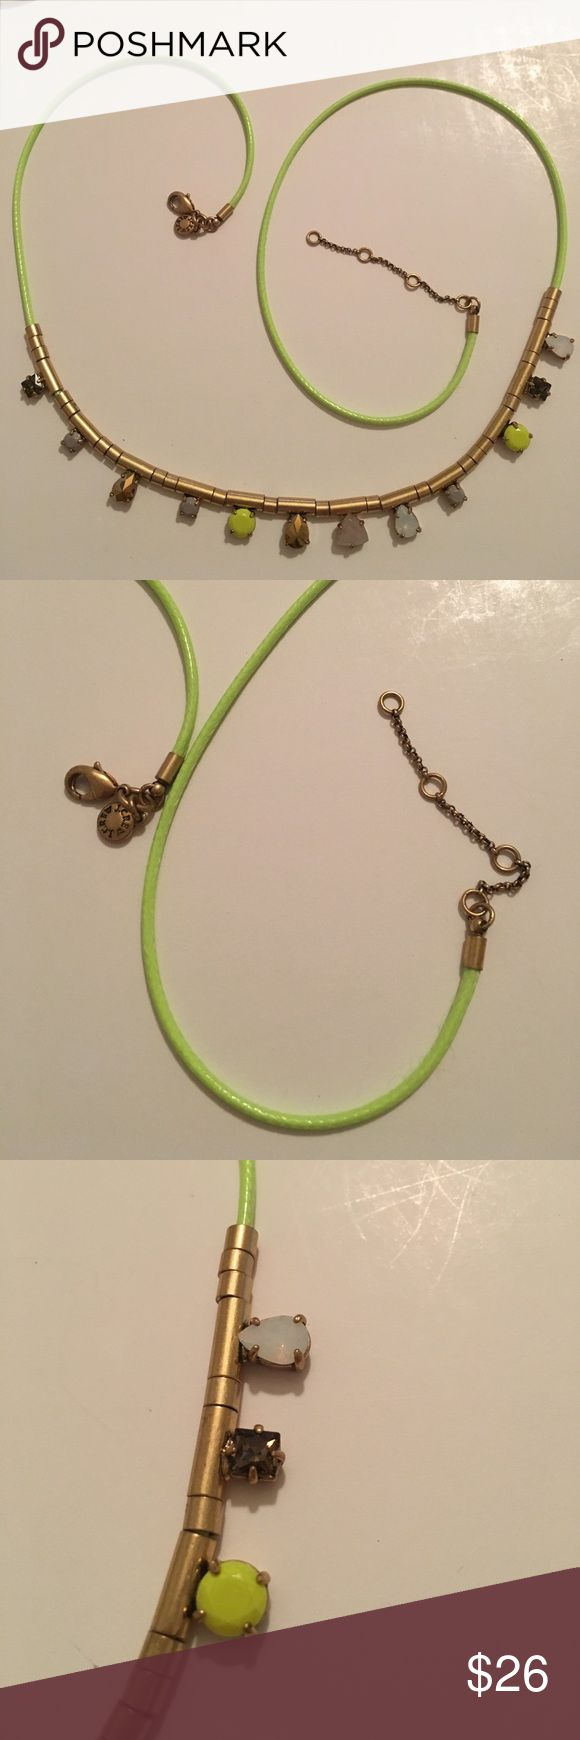 J crew necklace J crew neon green with crystals J. Crew Jewelry Necklaces